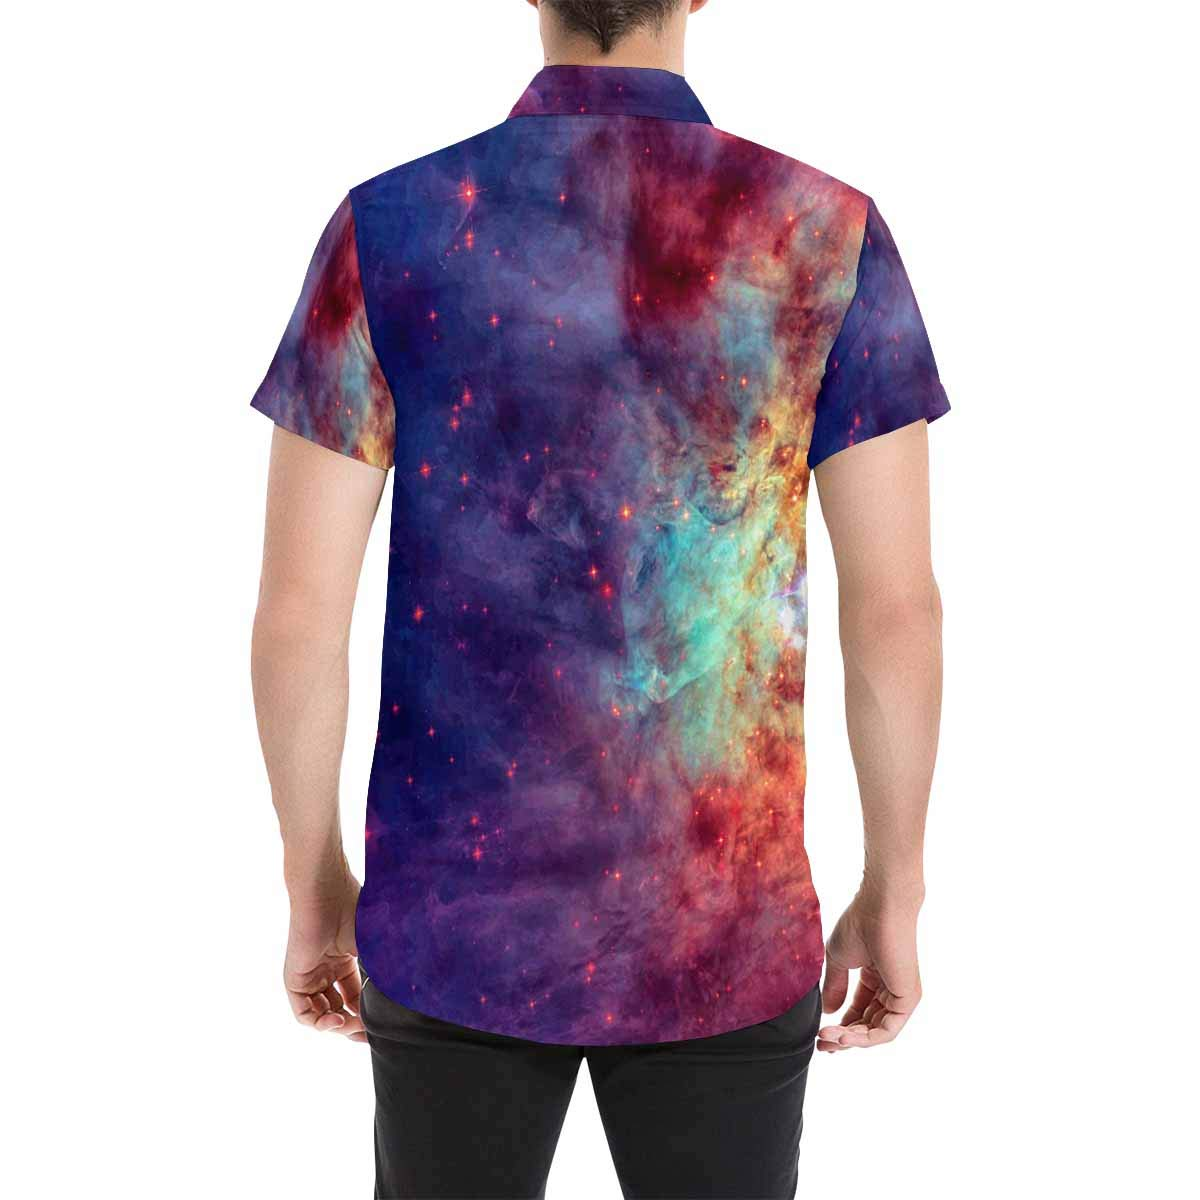 InterestPrint Men Botton Up T-Shirt Smiling Star and Sleeping Moon Regular Fit Short Sleeve Polo Casual T-Shirts